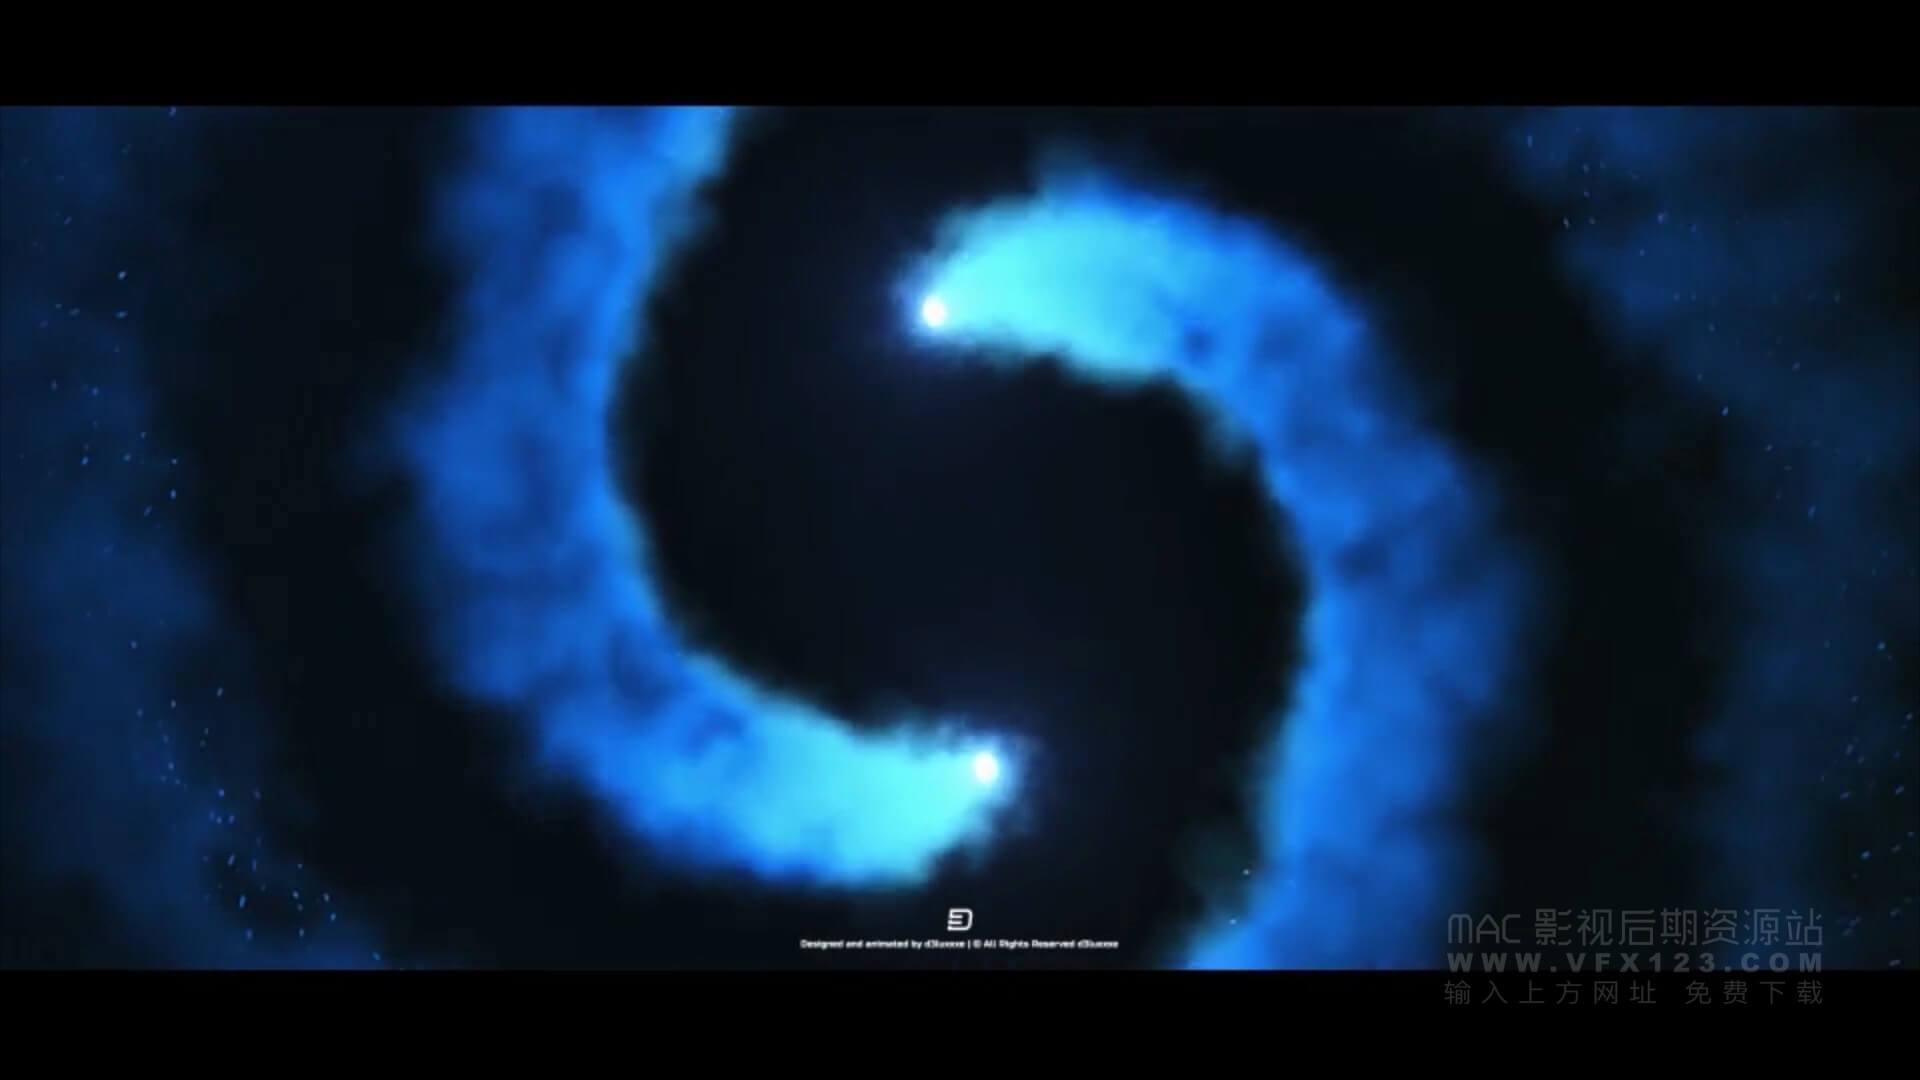 Motion模板 烟雾粒子汇聚效果LOGO徽标展示 Smoke Trails Logo Reveal